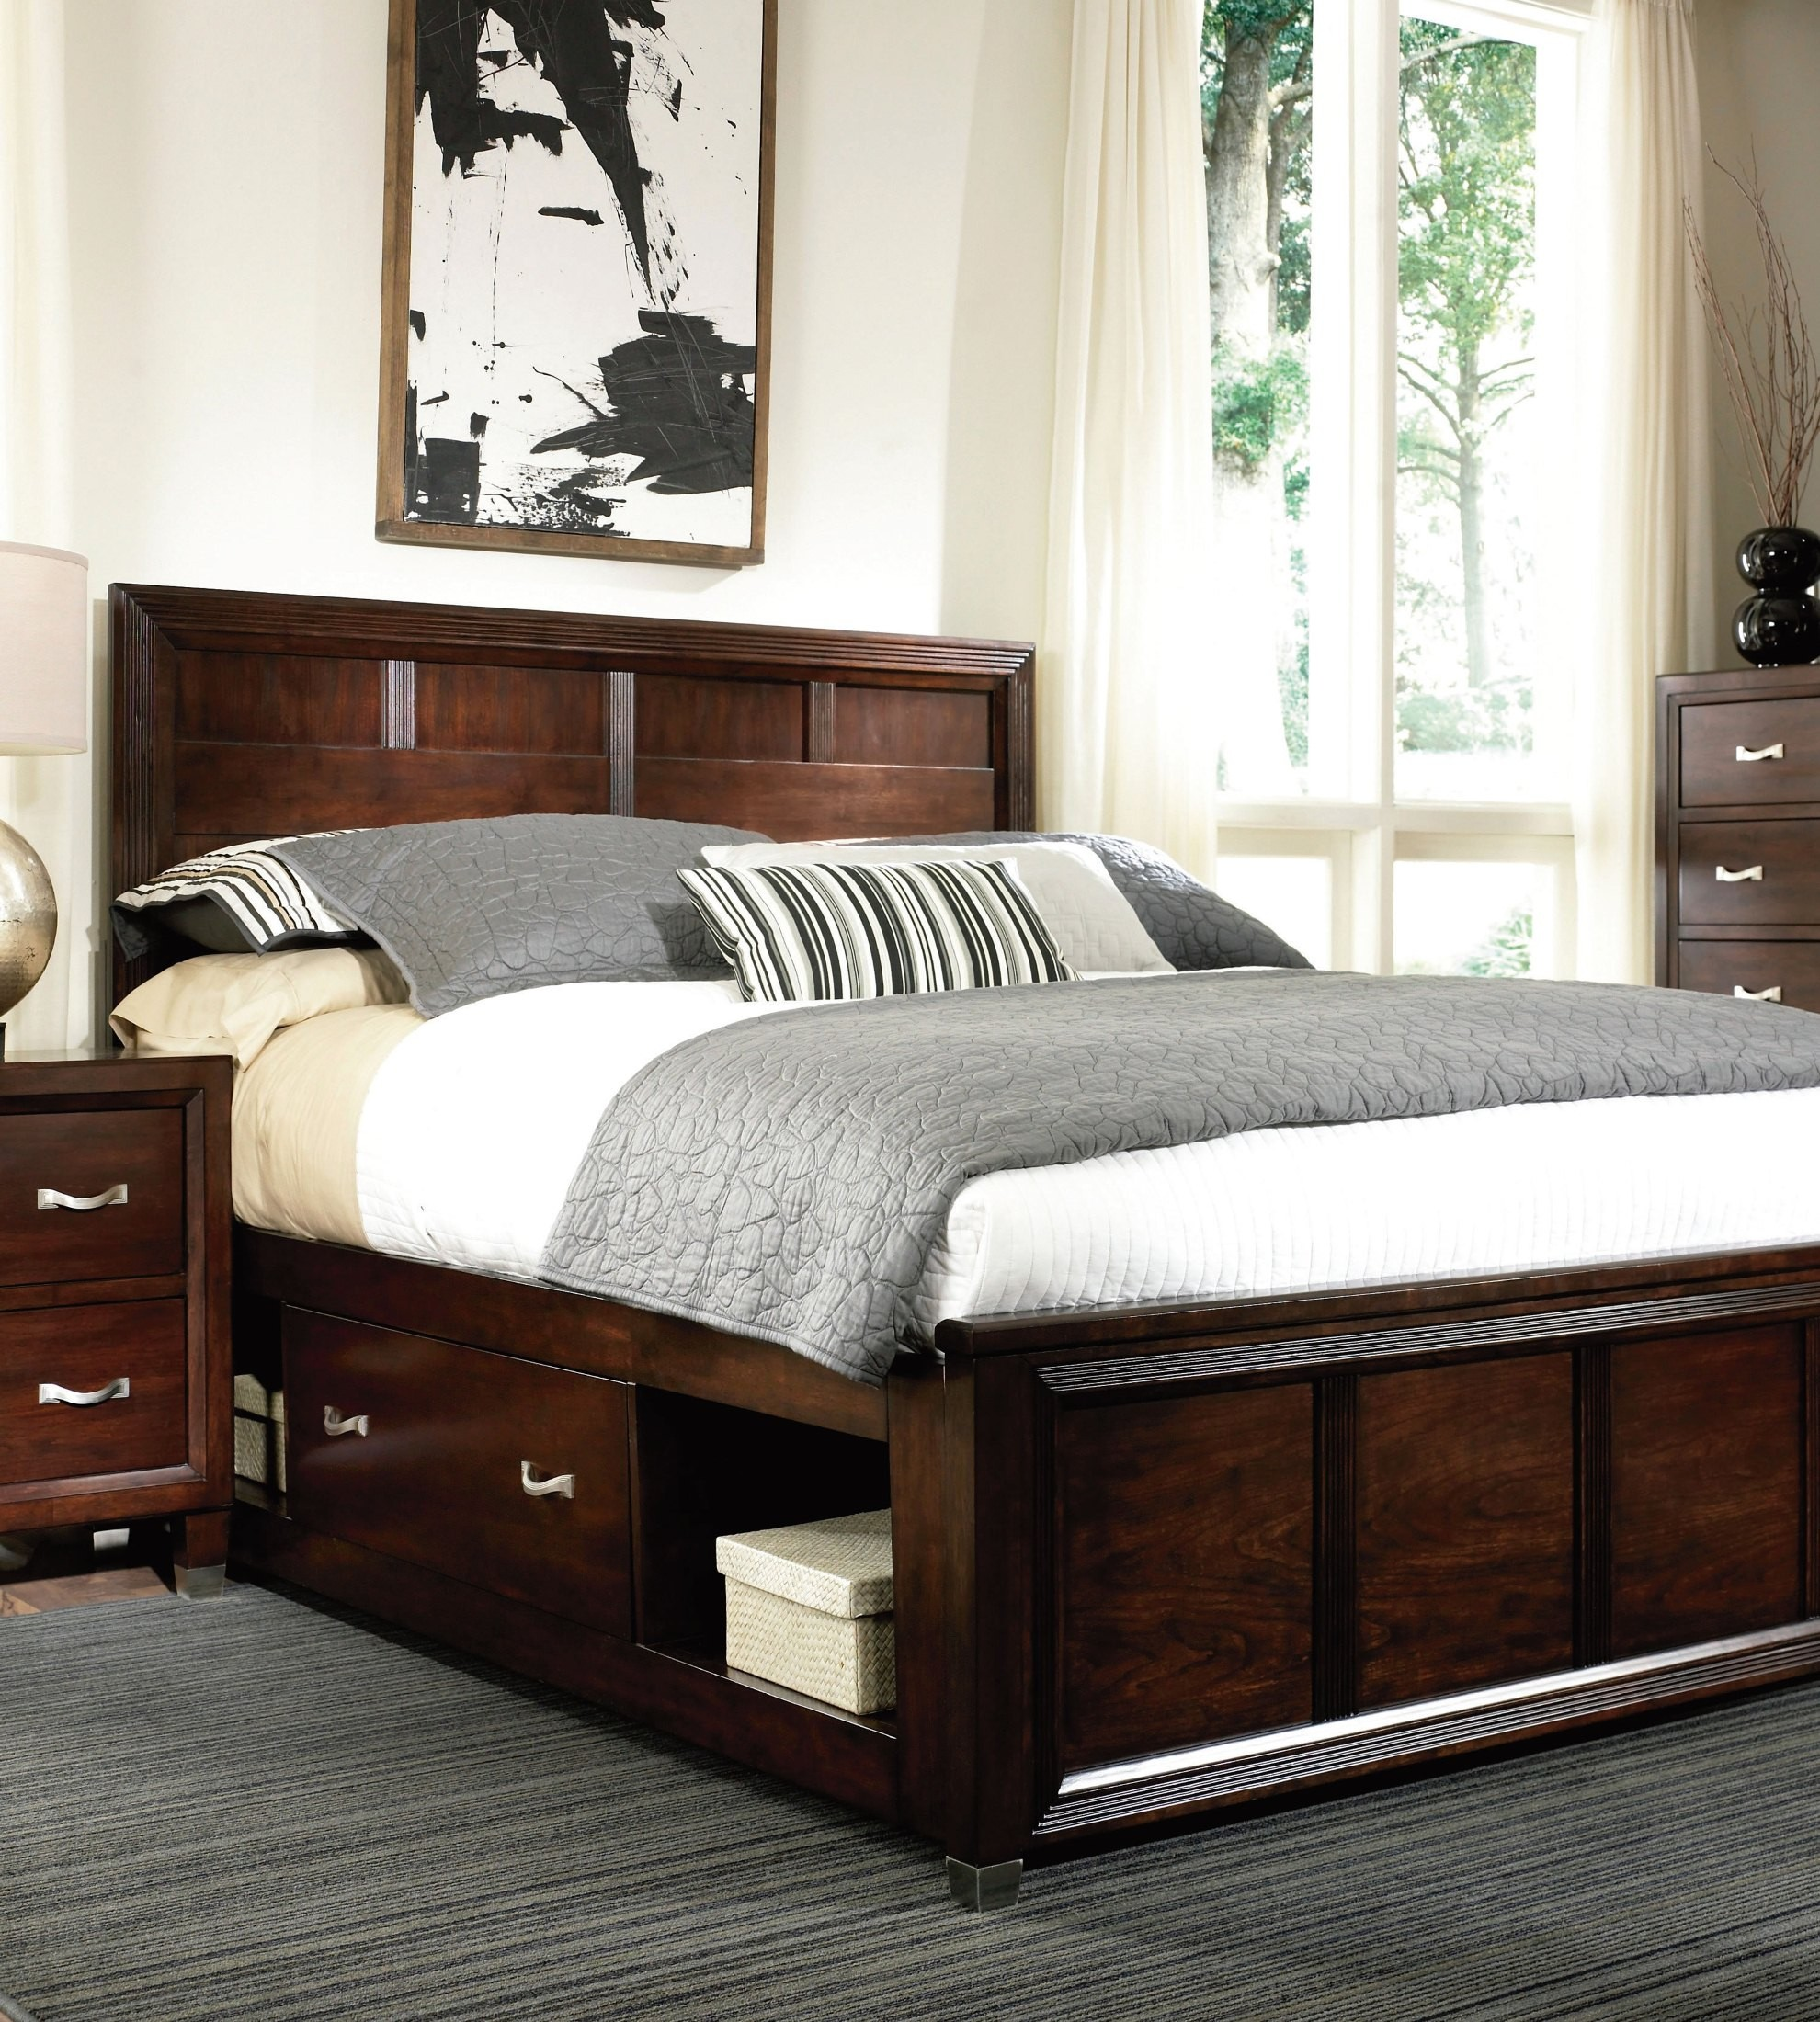 Eastlake 2 dual storage panel bedroom set 4264 250 261 for Storage eastlake